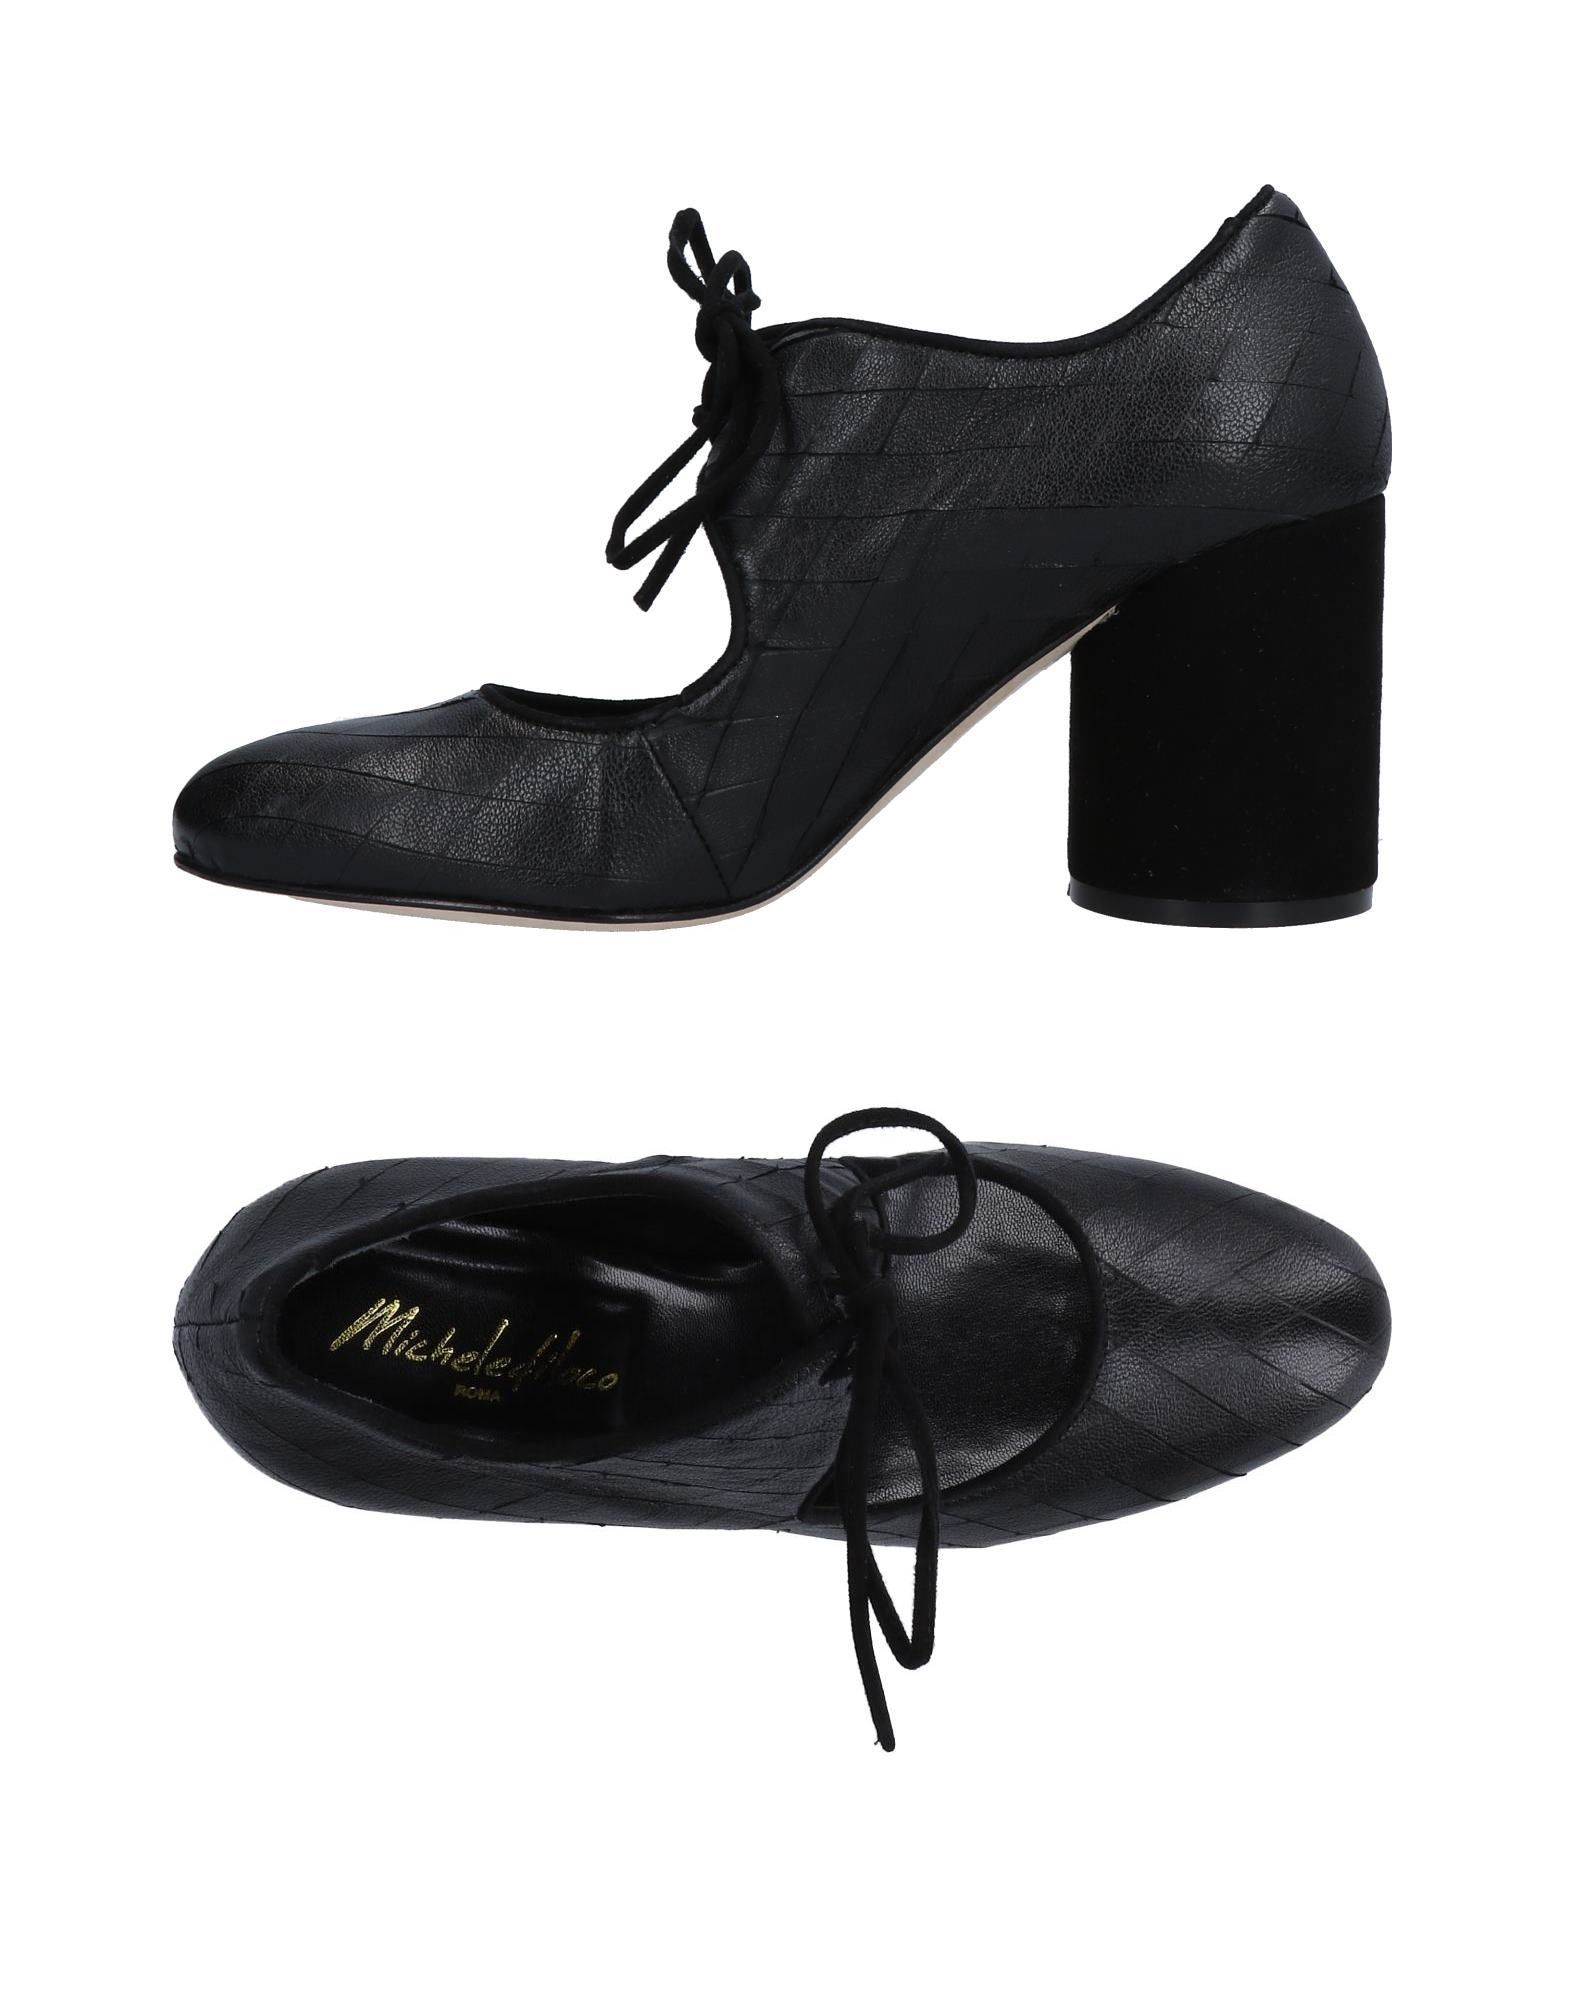 Haltbare Mode billige Schuhe Michelediloco Pumps Damen  11513899FN Heiße Schuhe